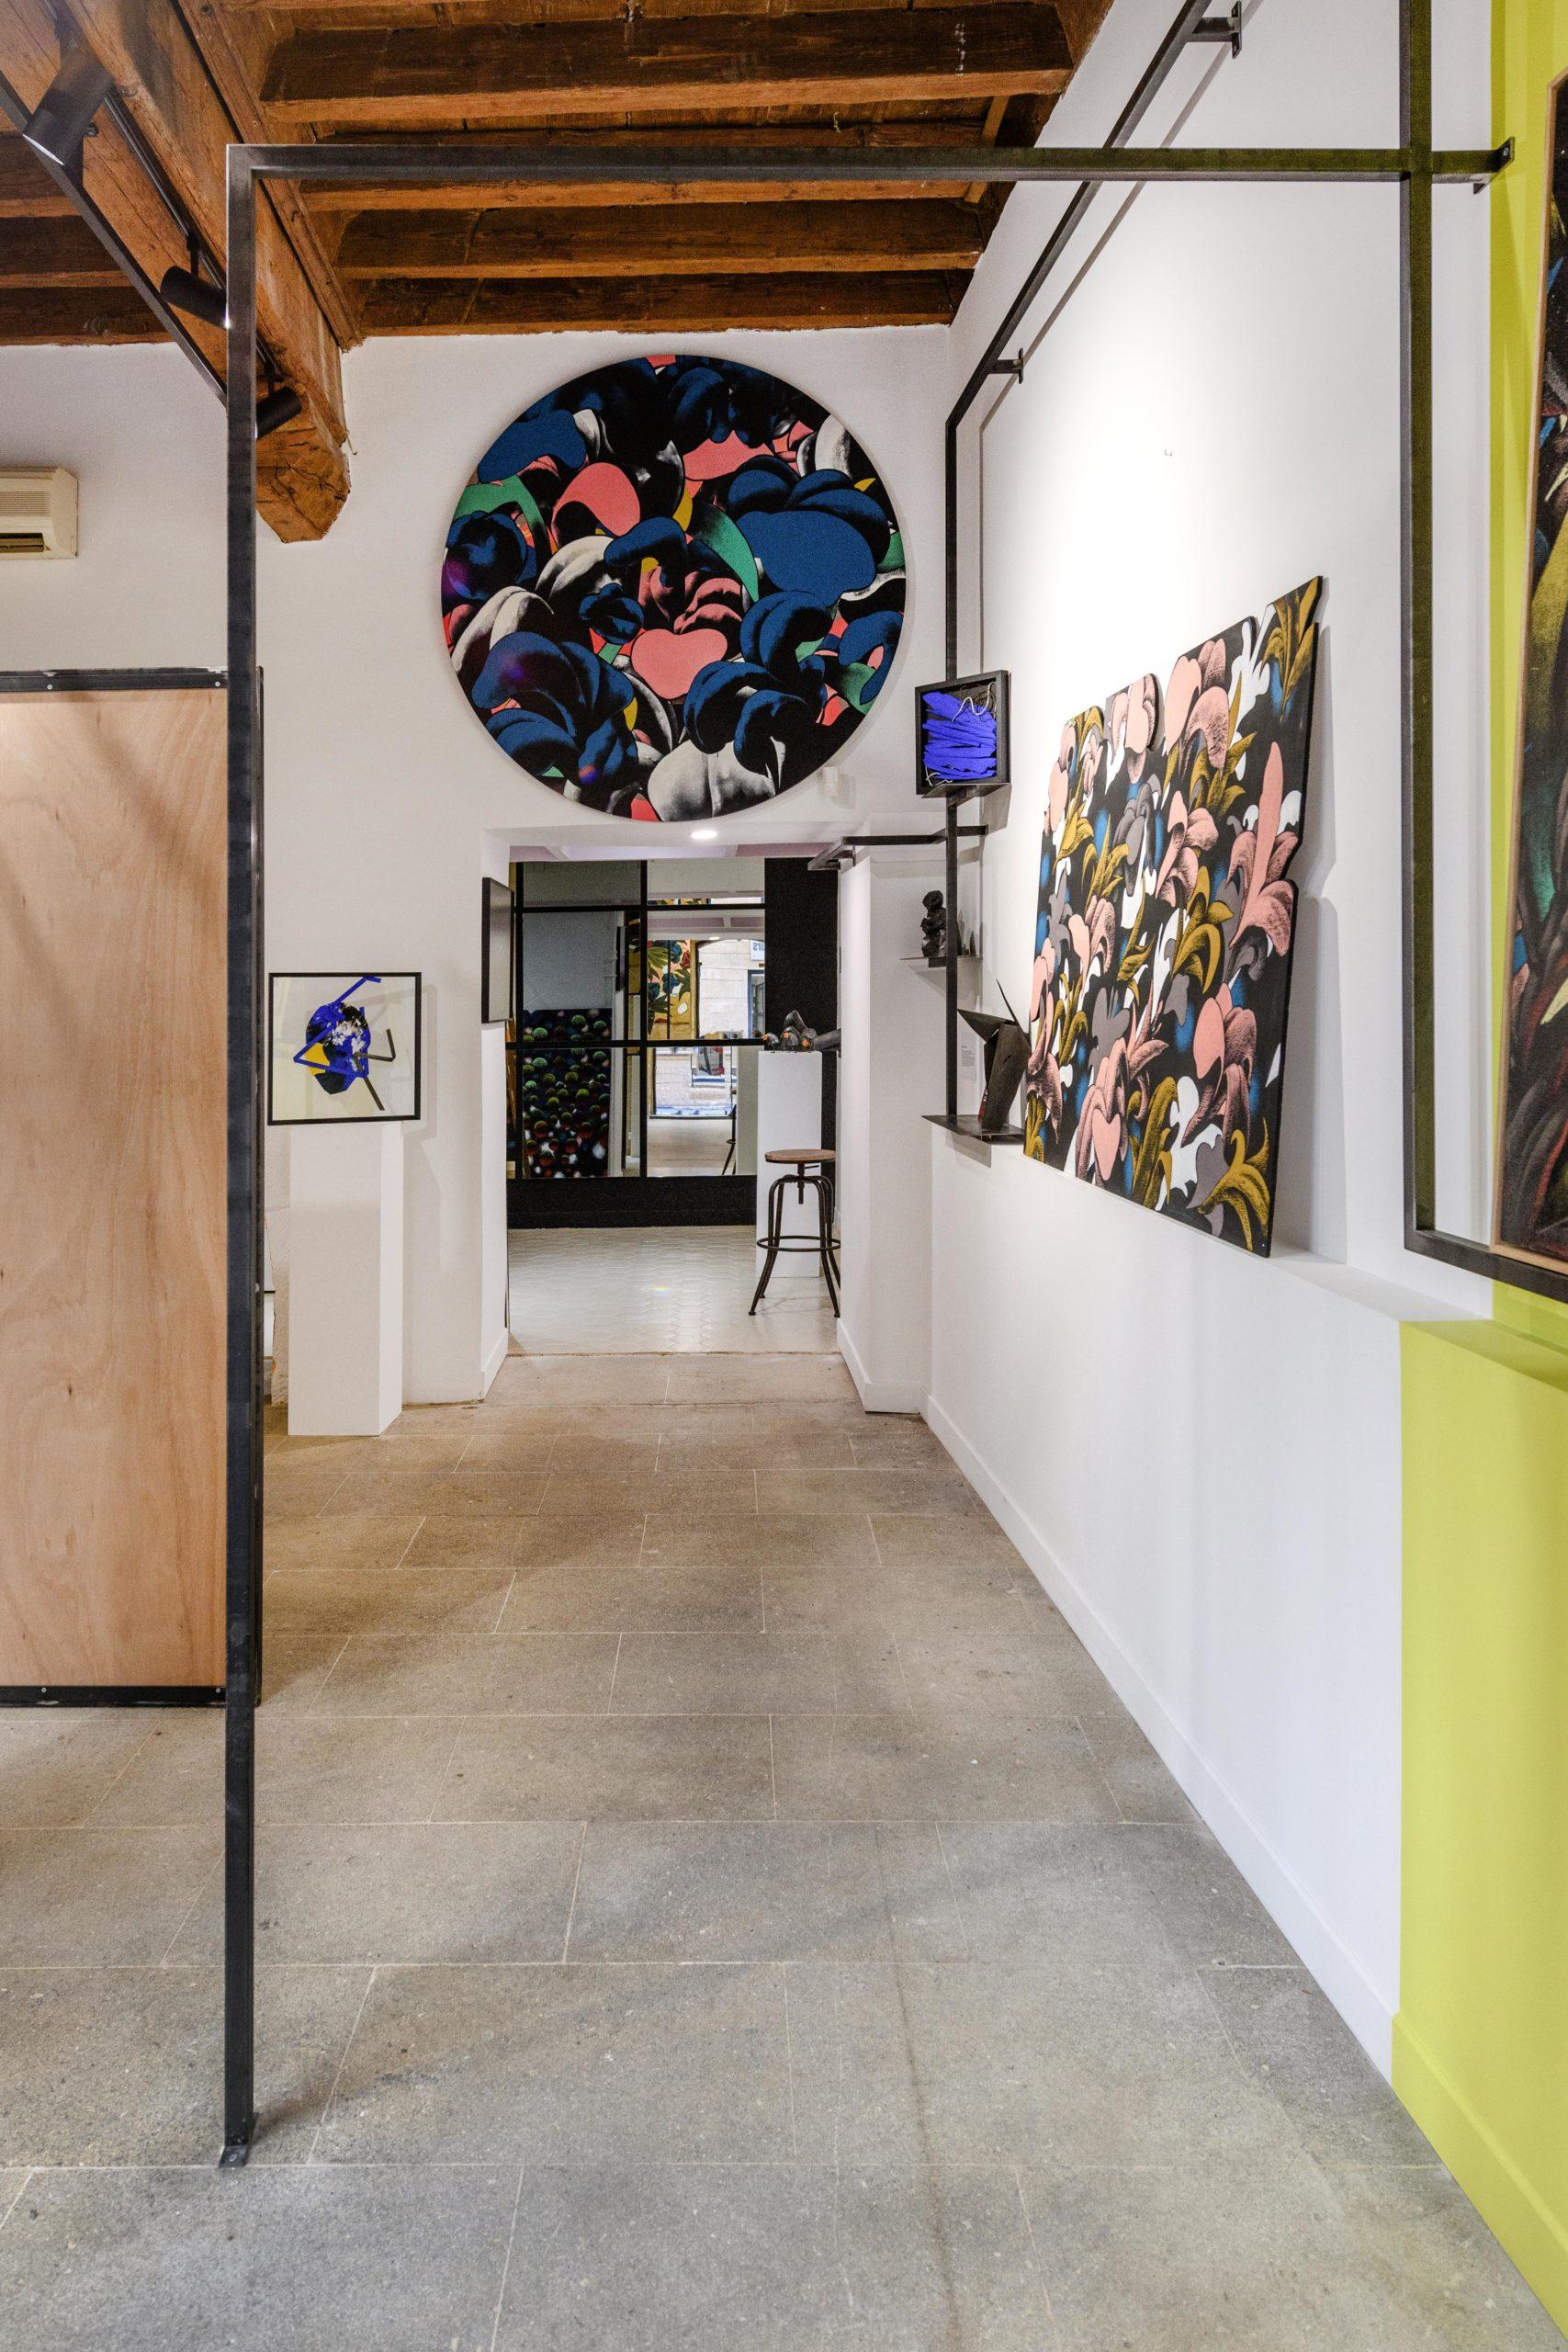 Galerie d'art contemporain Ars Longa